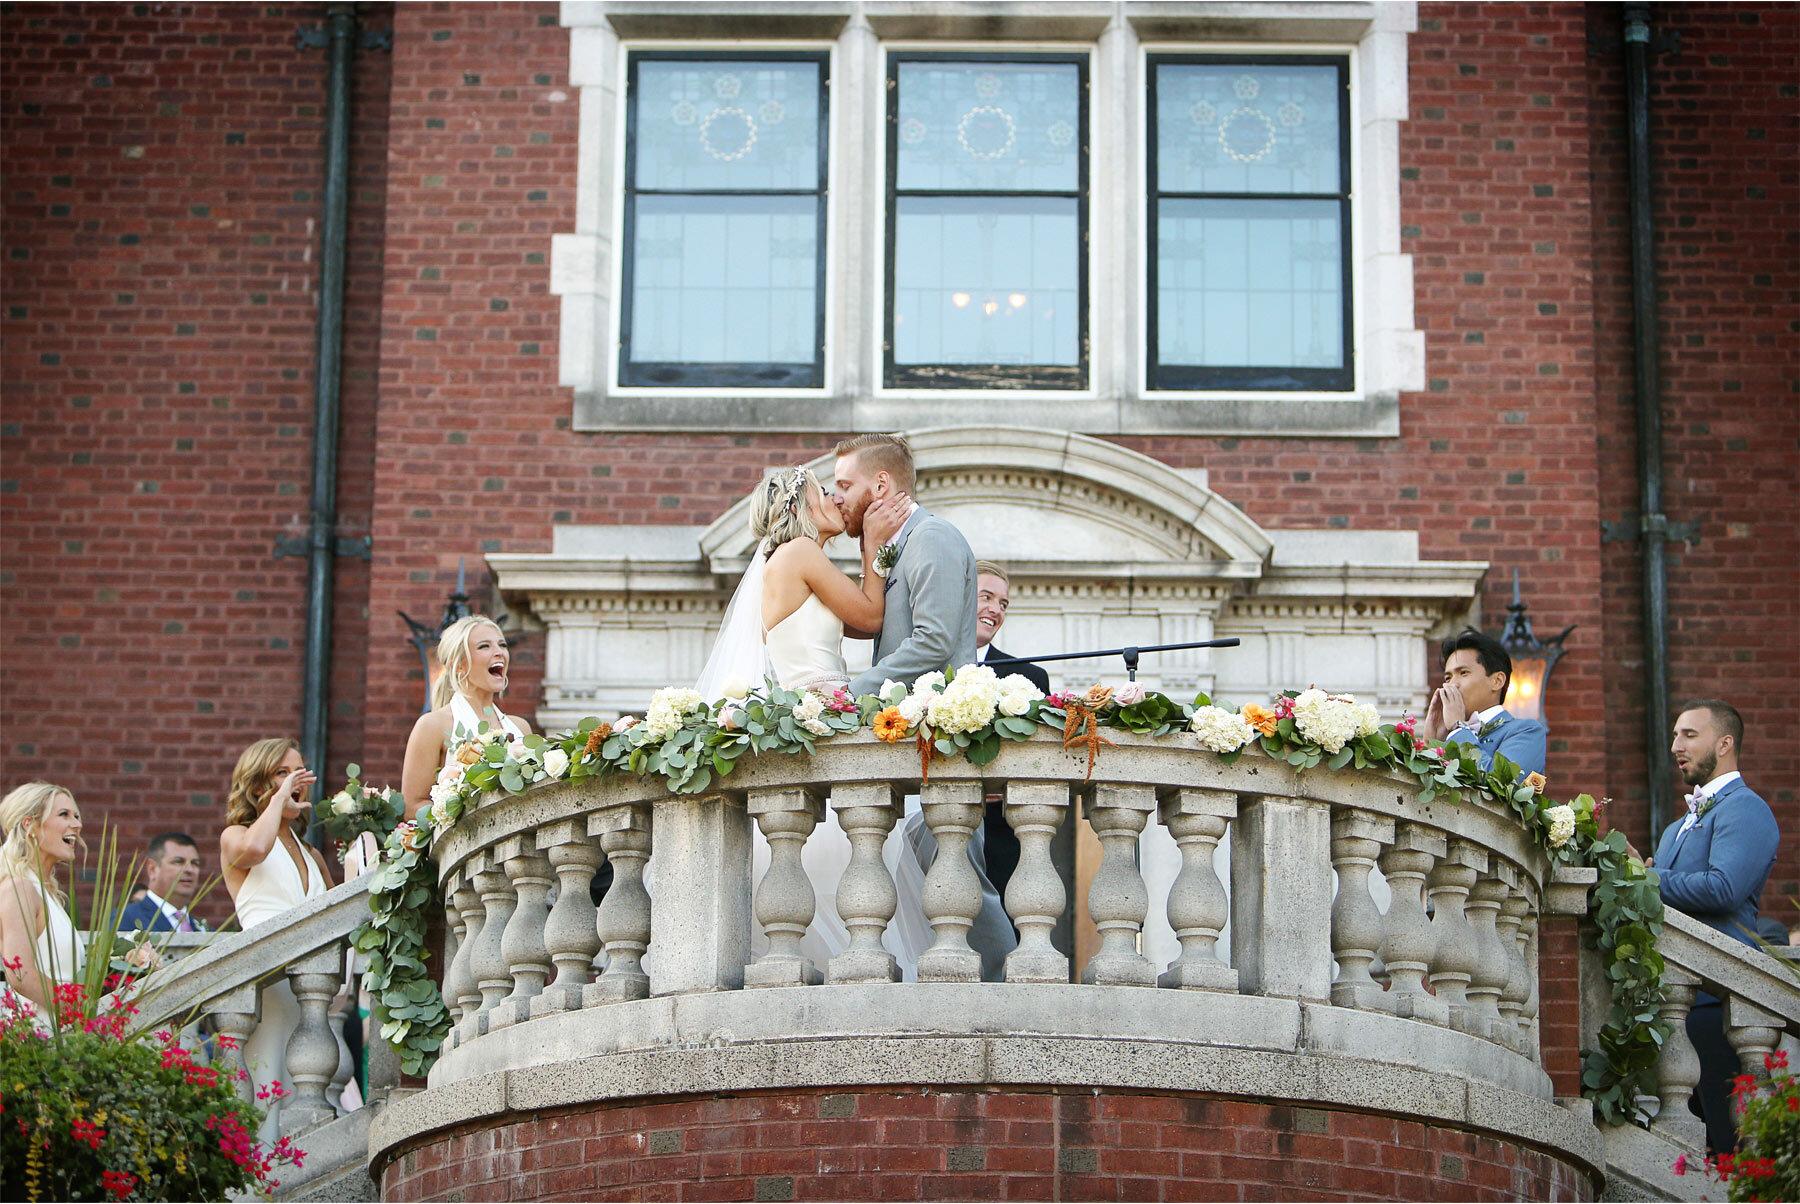 16-Vick-Photography-Wedding-Duluth-Minnesota-Glensheen-Mansion-Ceremony-Outdoor-Balcony-Catherine-and-John.jpg